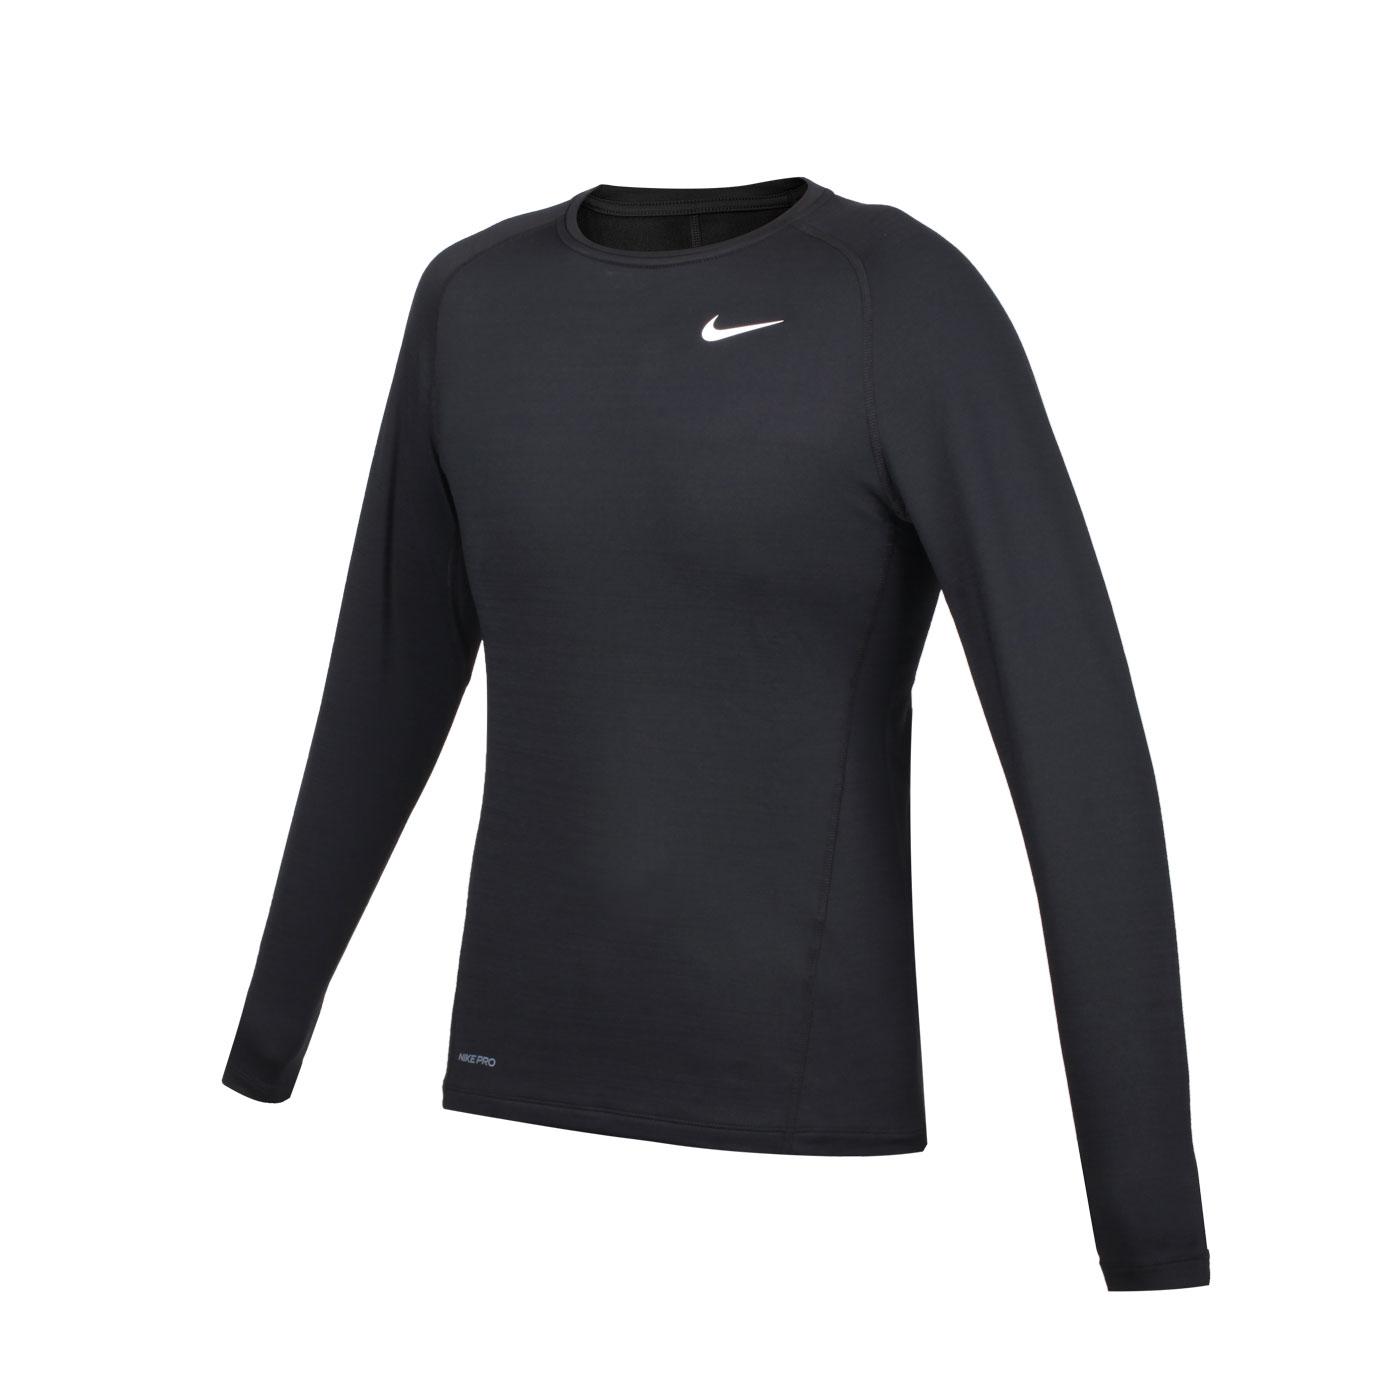 NIKE 男款緊身長袖T恤 CV3047-010 - 黑白